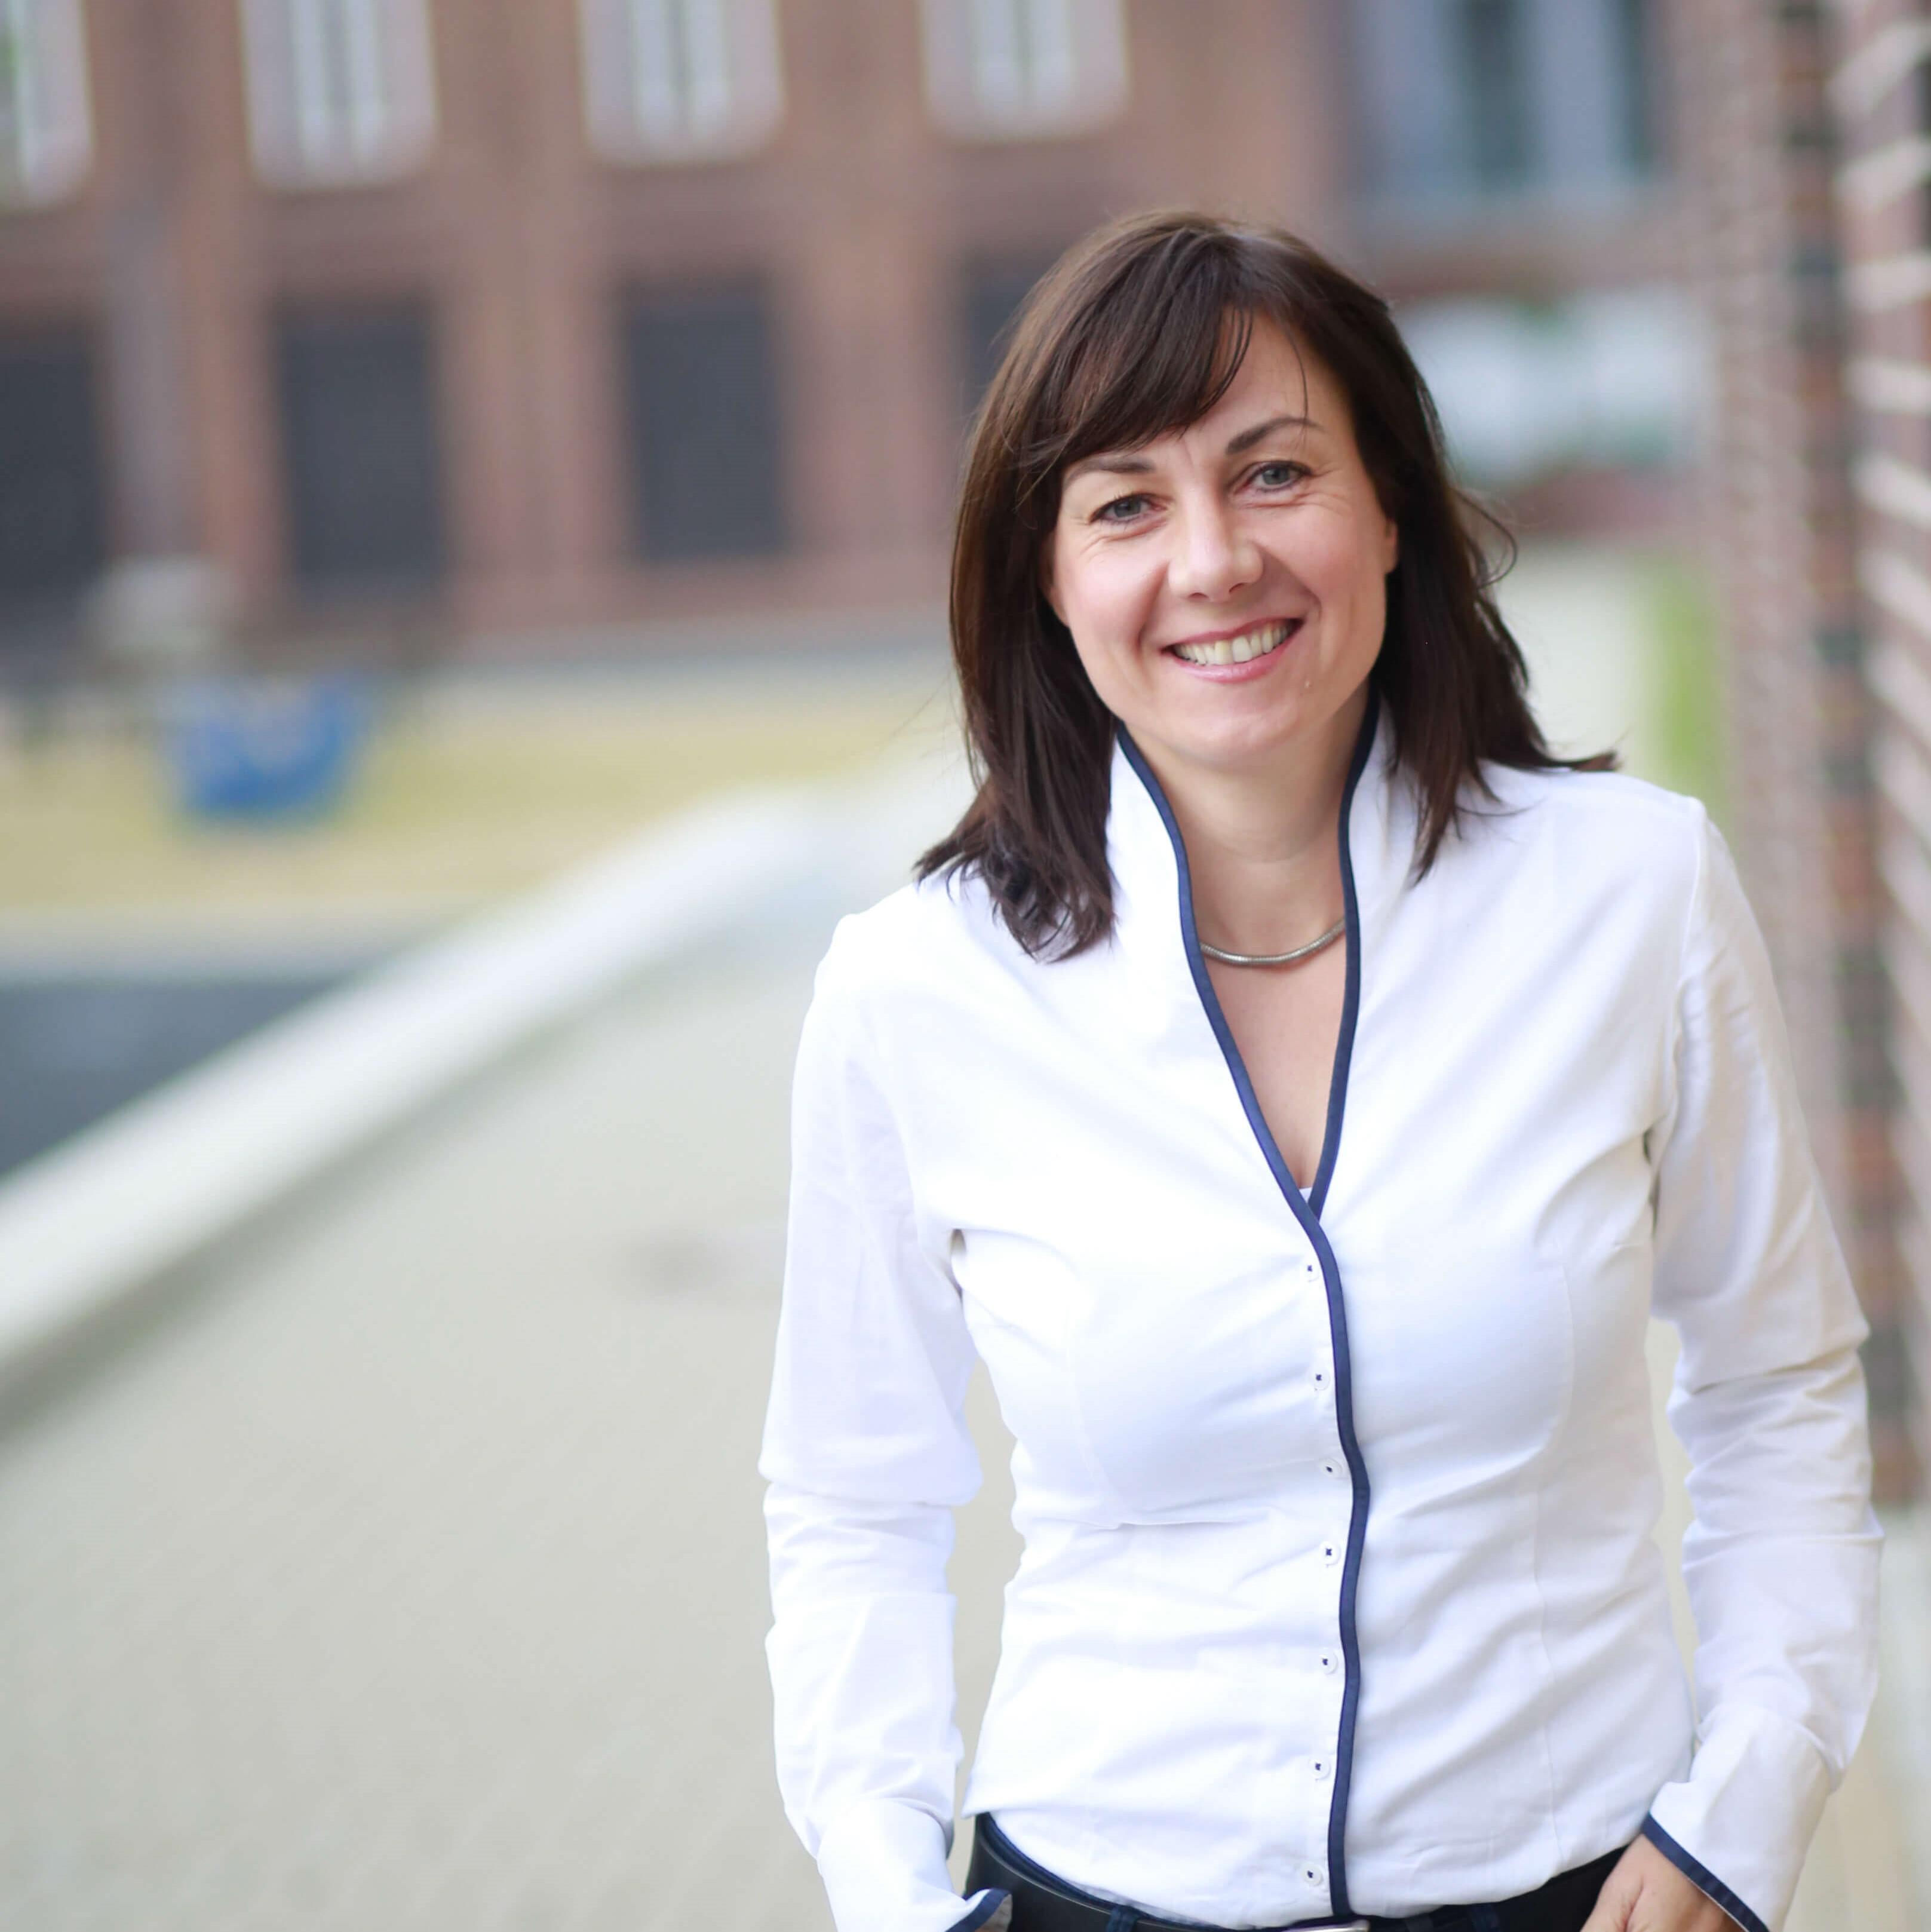 Trainerin Katja Wolter Kpmpakt-Kurs Management